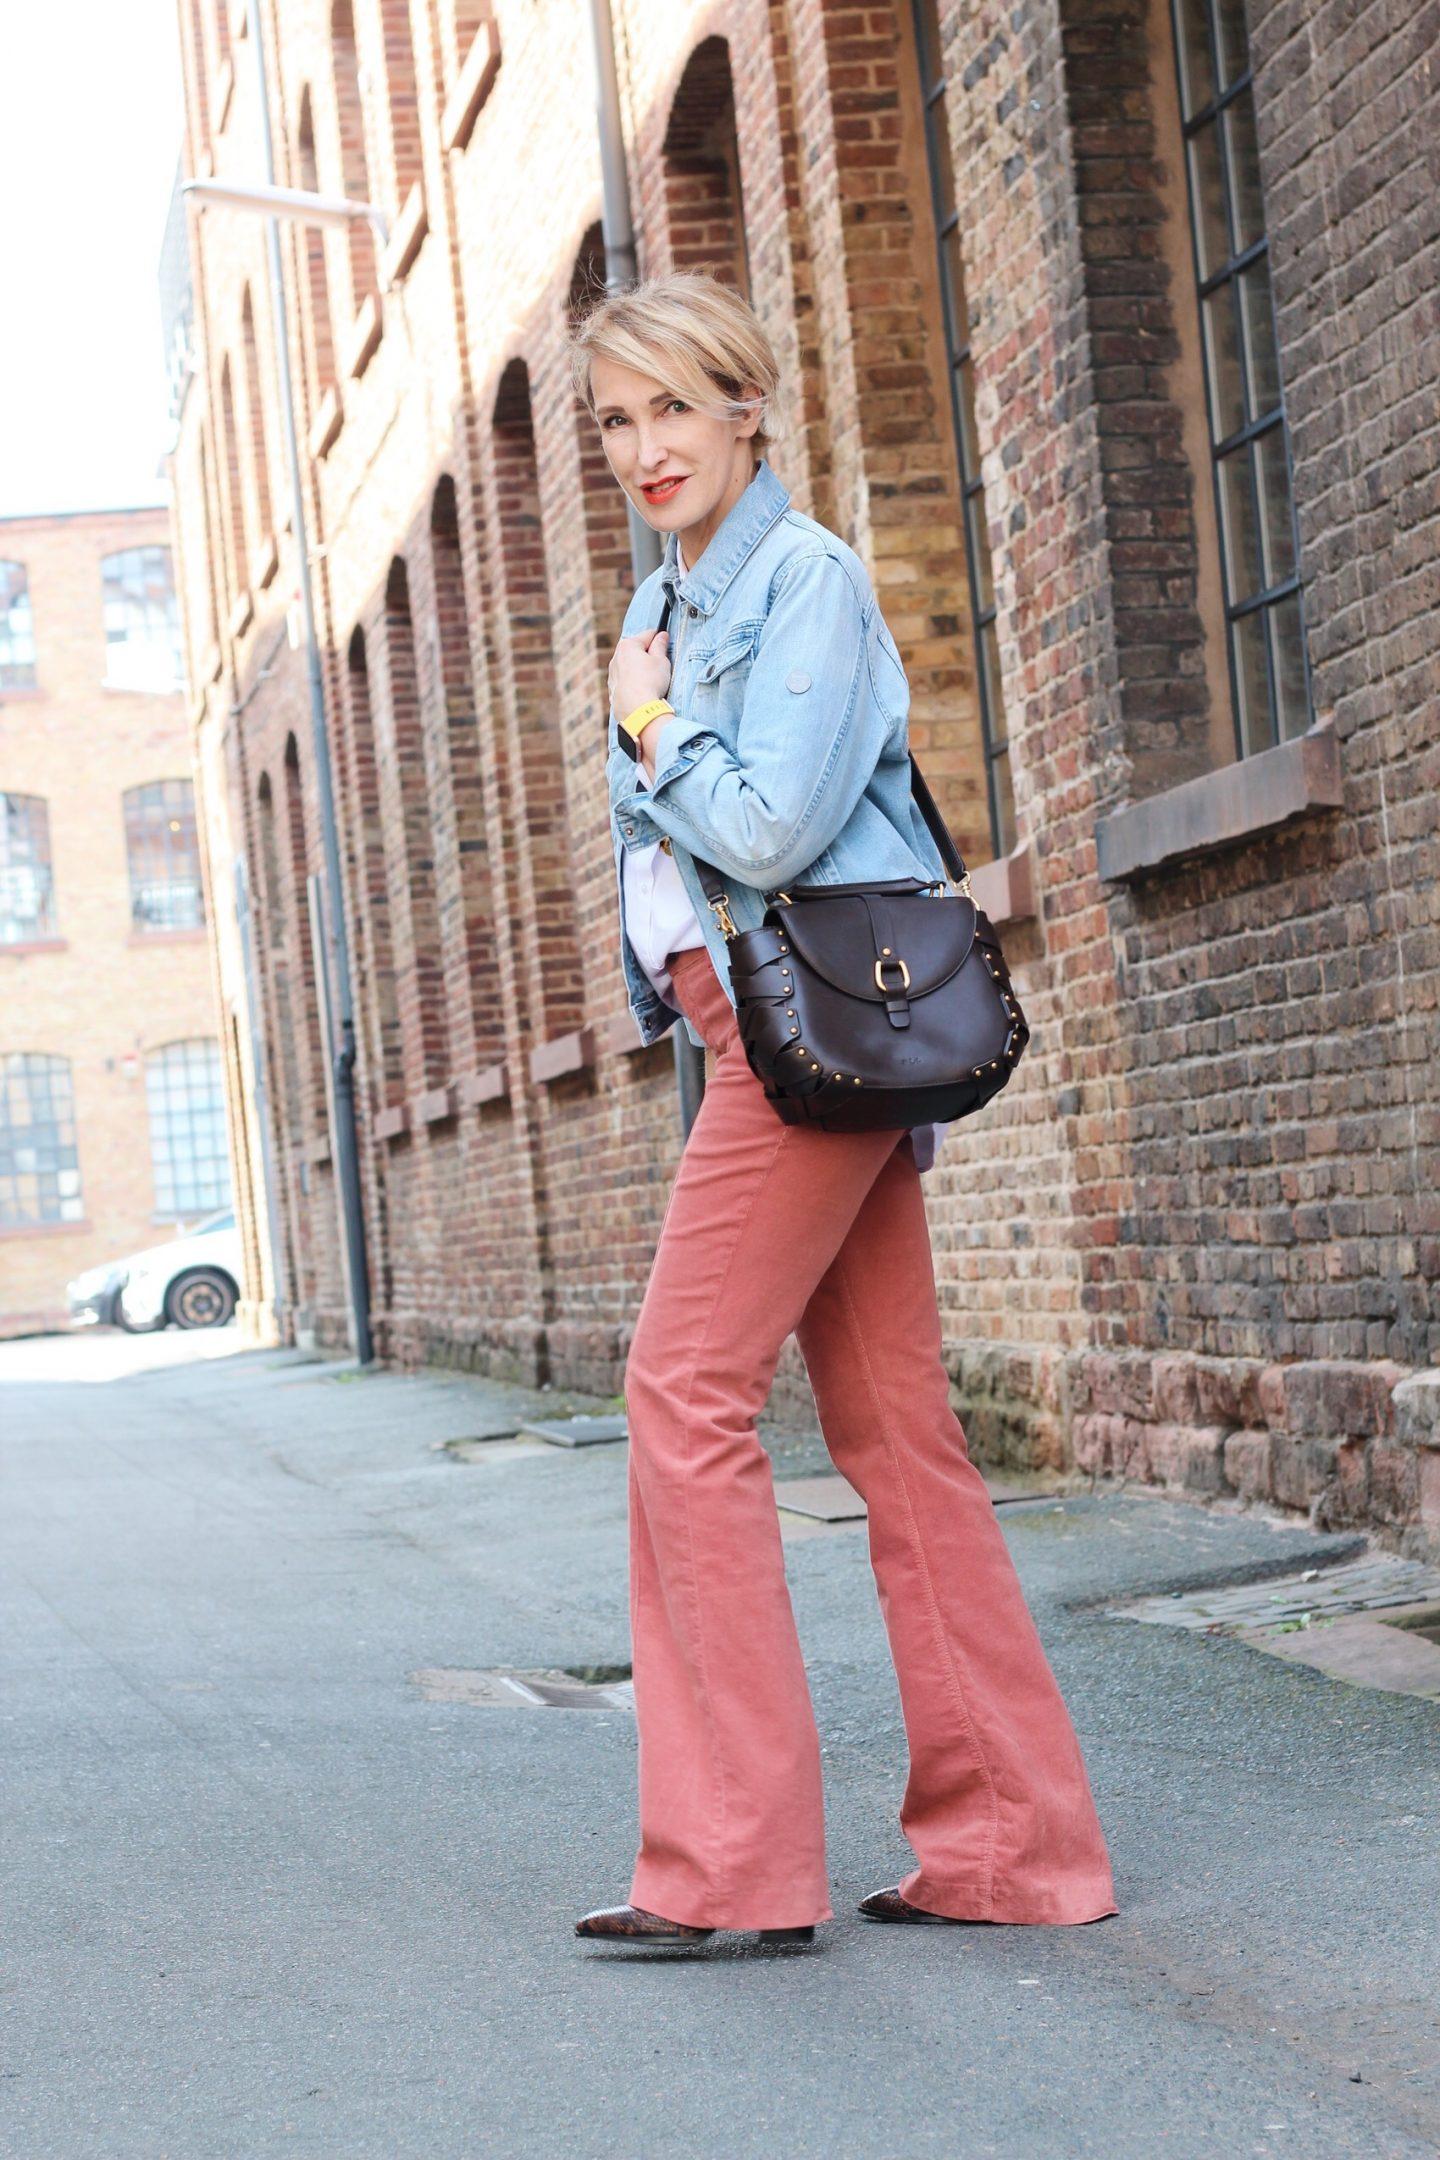 glamupyourlifestyle cordhosen jeansjacke klassische-wieße-bluse ü-40-blog ü-50-blog ue-40-mode ue-50-mod